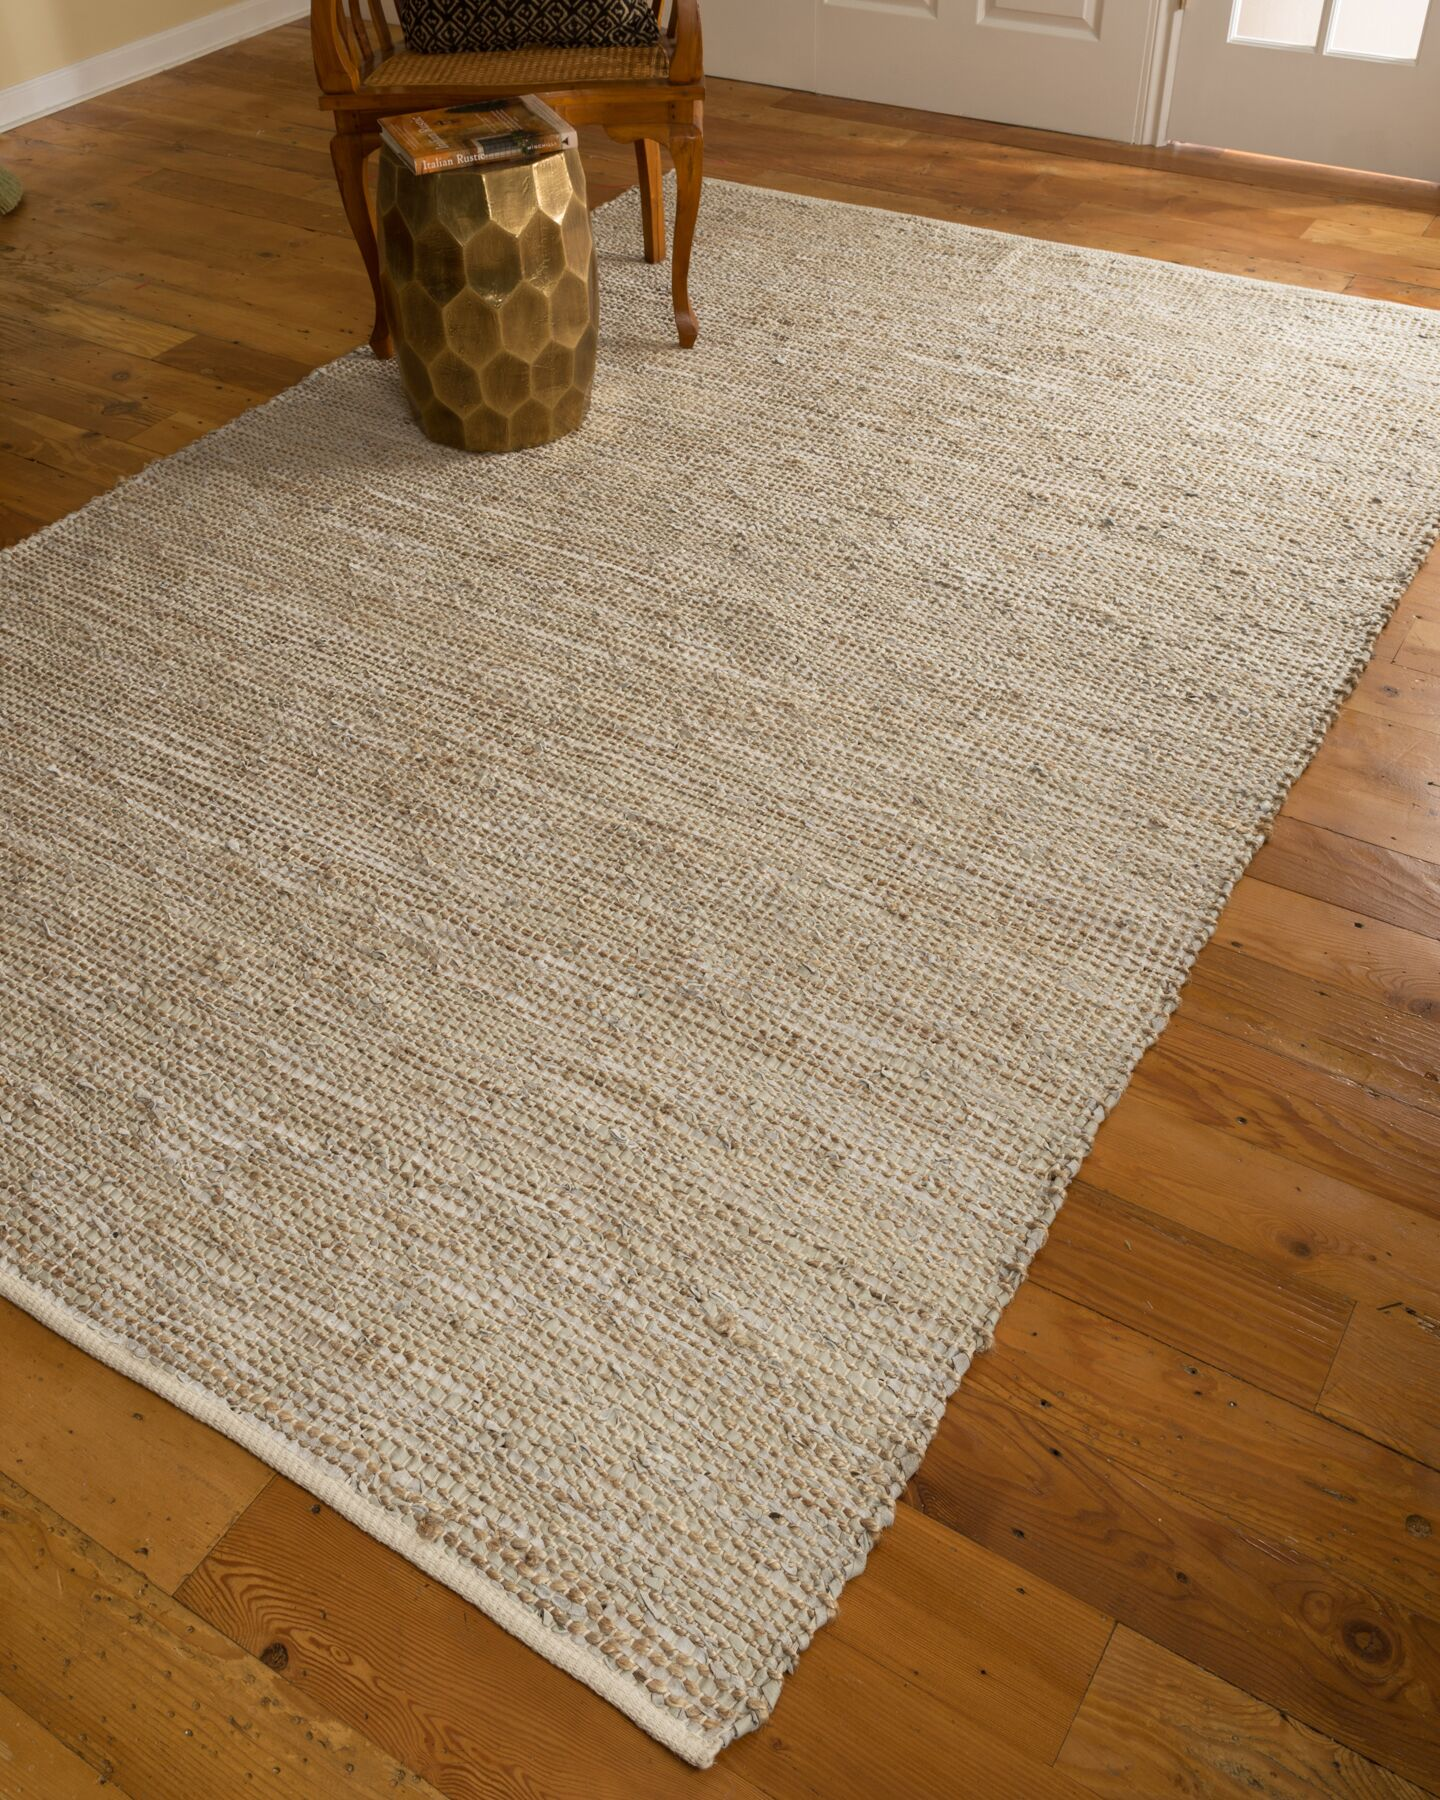 Hand-Loomed Beige Area Rug Rug Size: Rectangle 6' x 9'